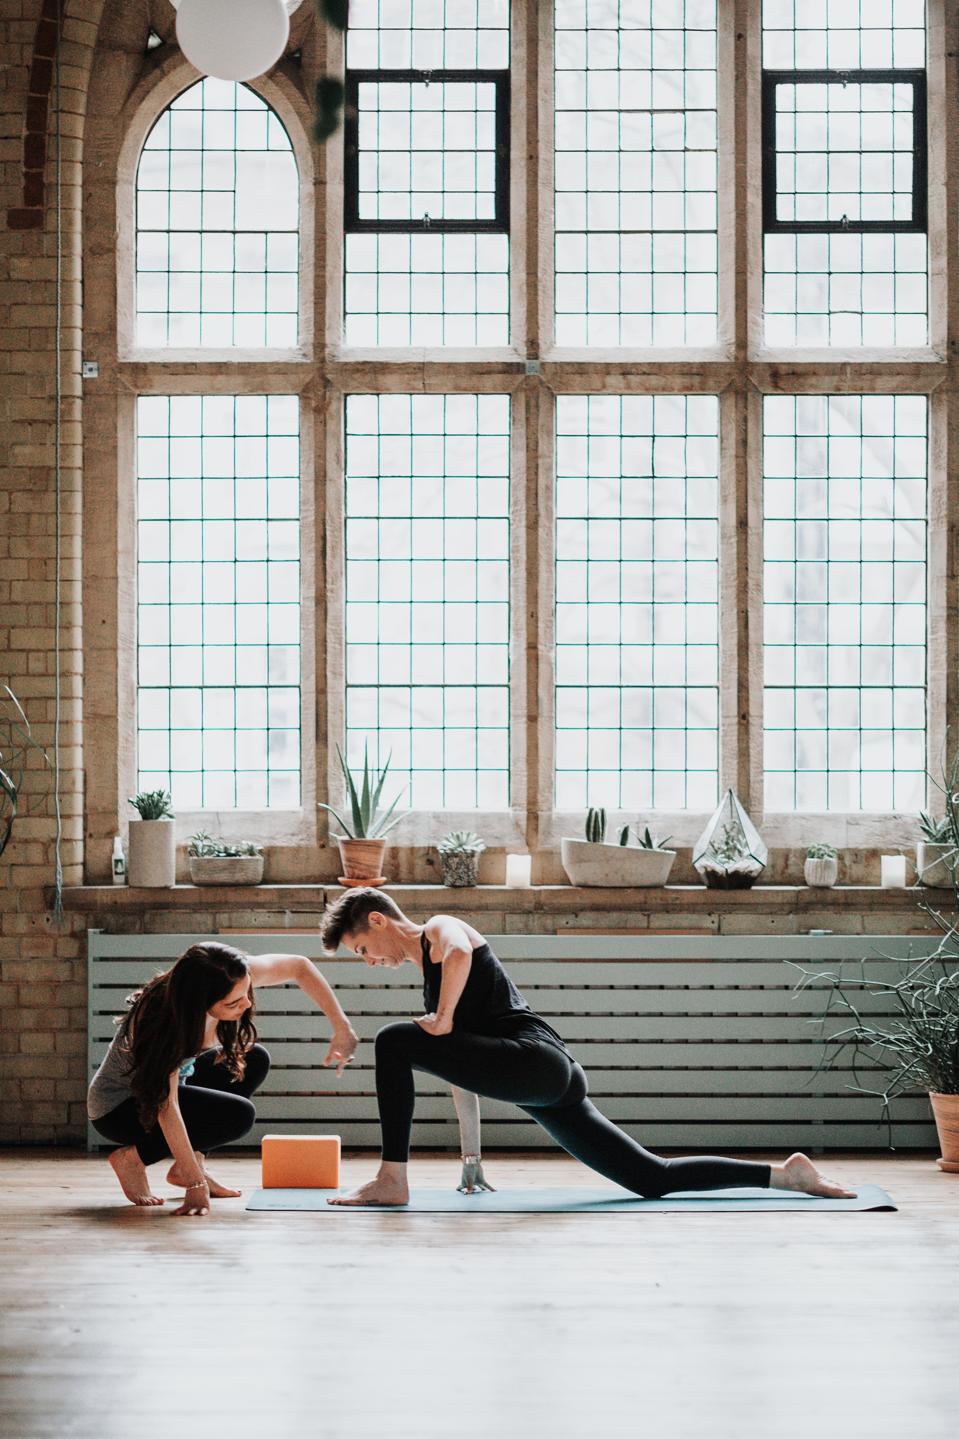 Yogi2me, an at-home yoga app